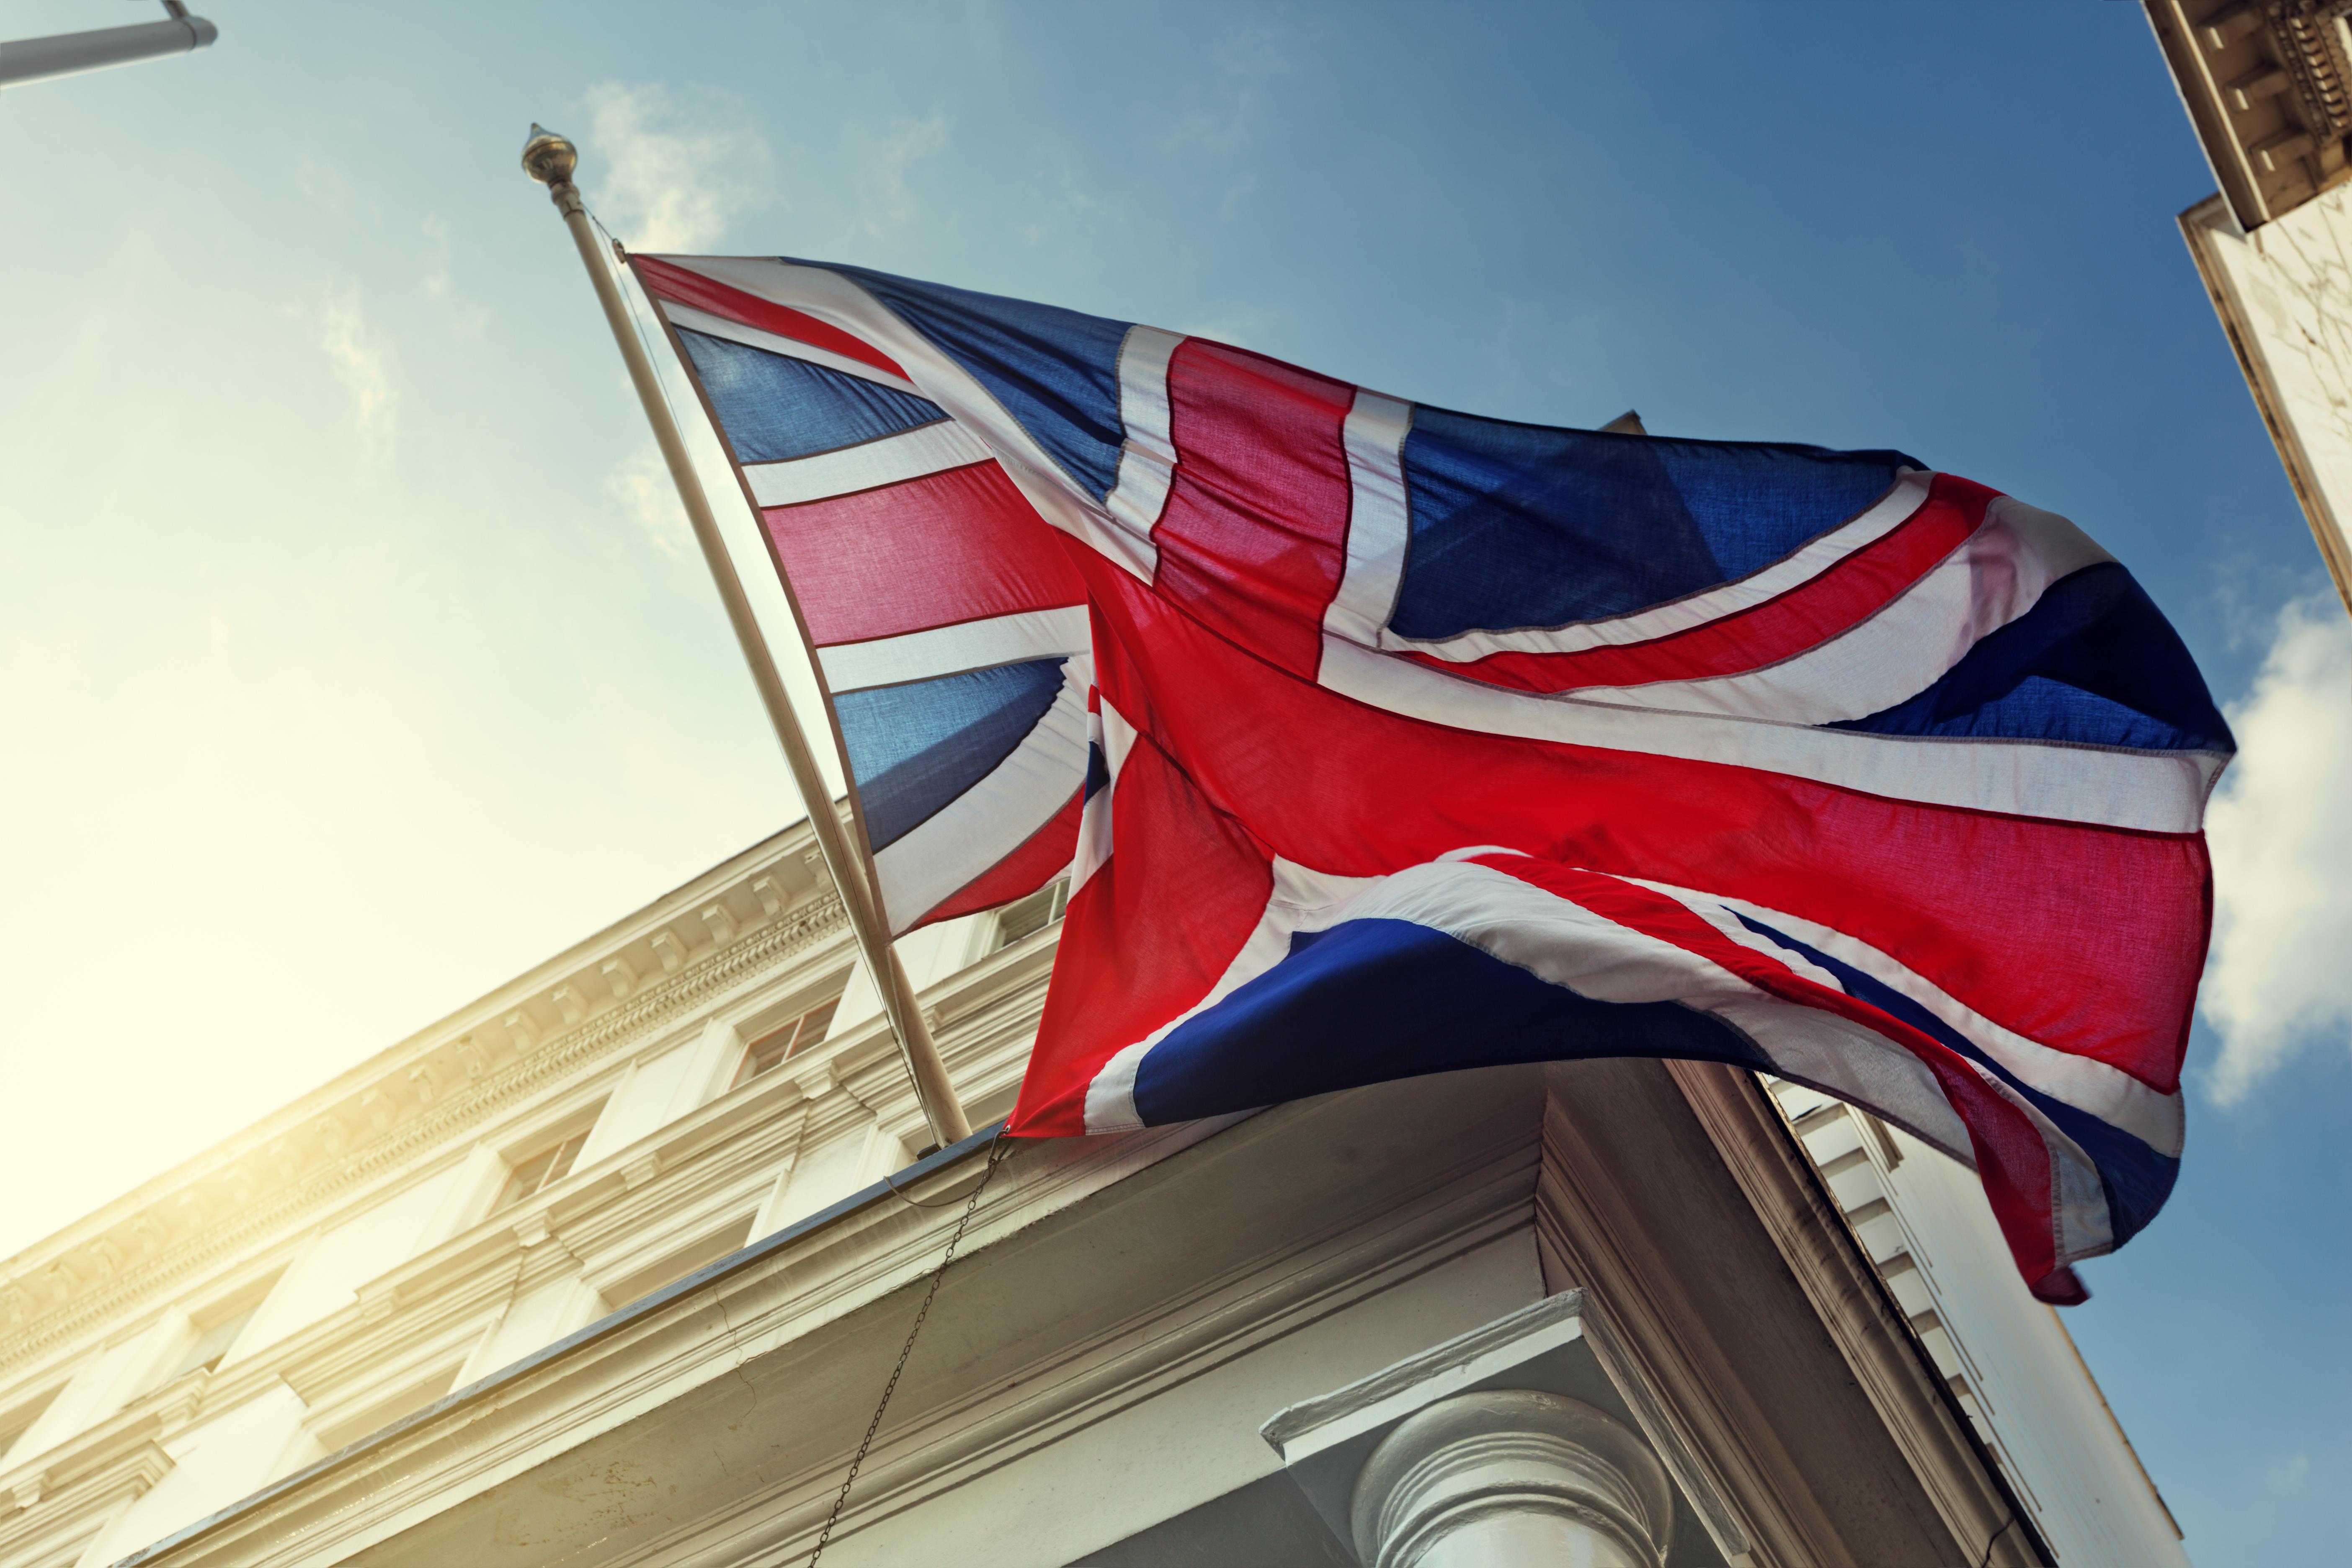 General 5616x3744 Union Jack London England Britain flag British building clear sky union flag blue red